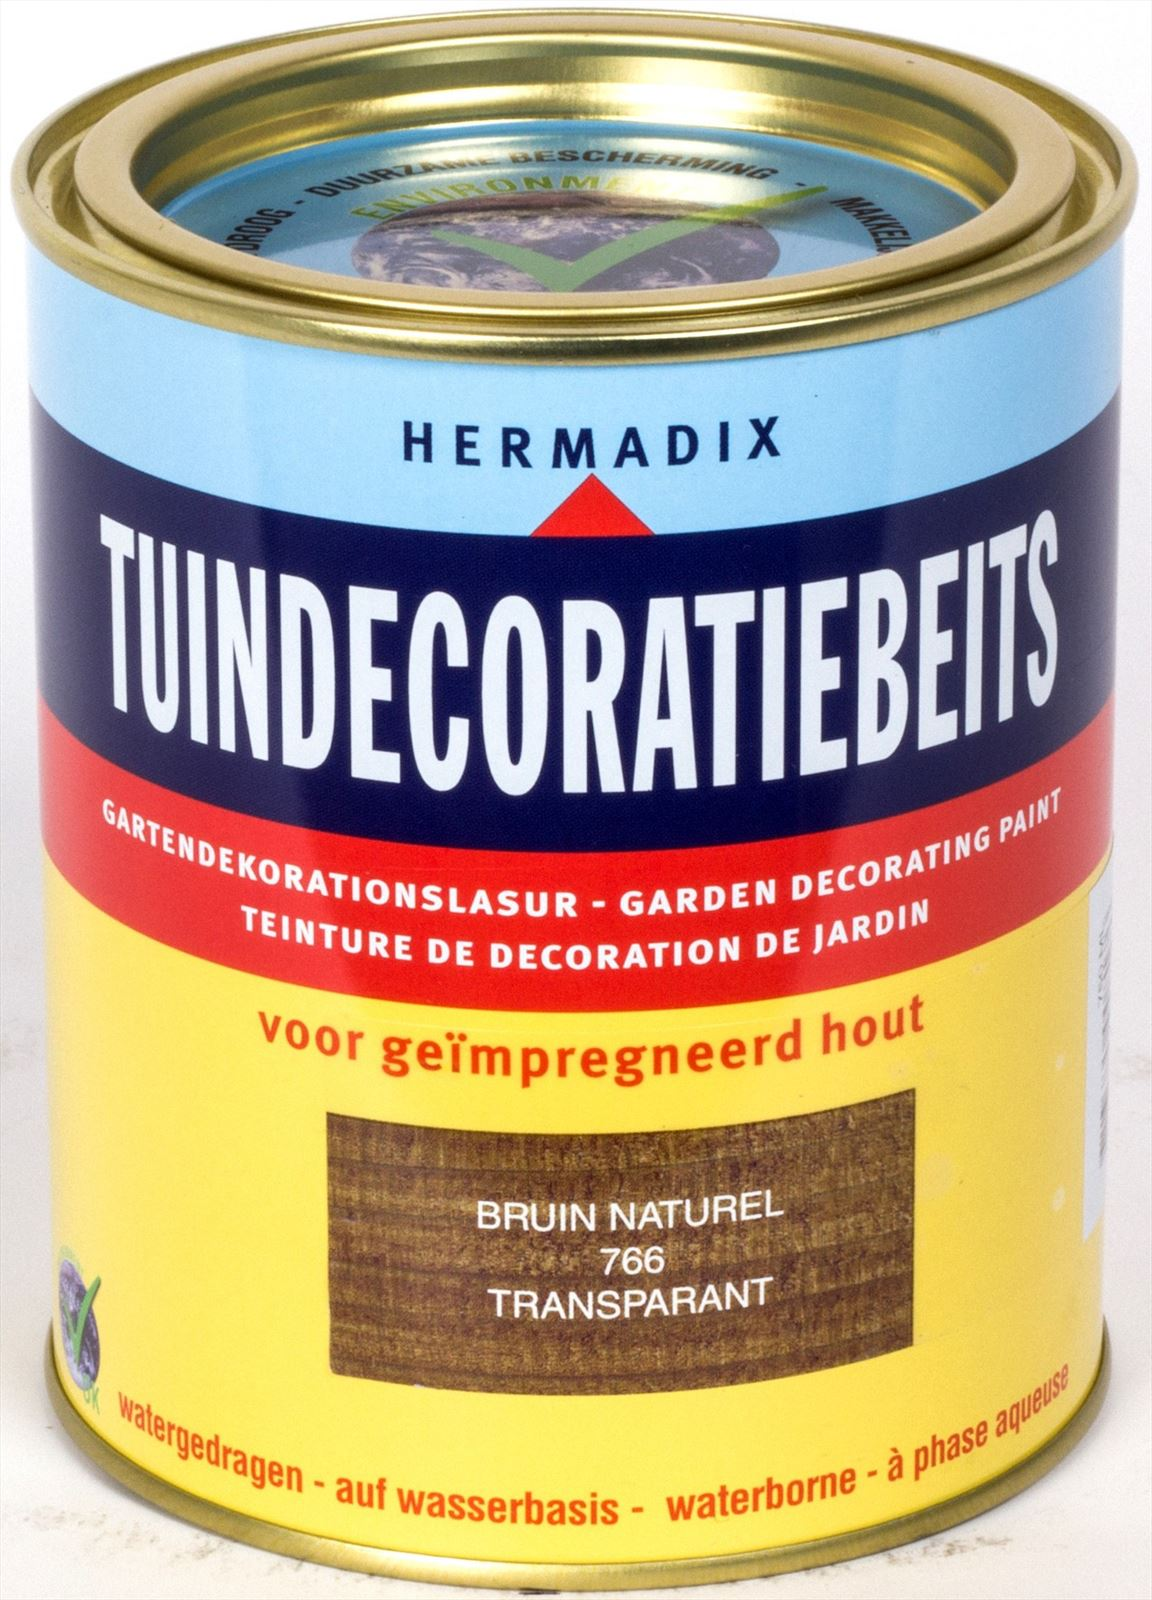 Hermadix beits Hermadix tuindecoratiebeits, transparant, nr. 766 bruin, blik 0,75 liter